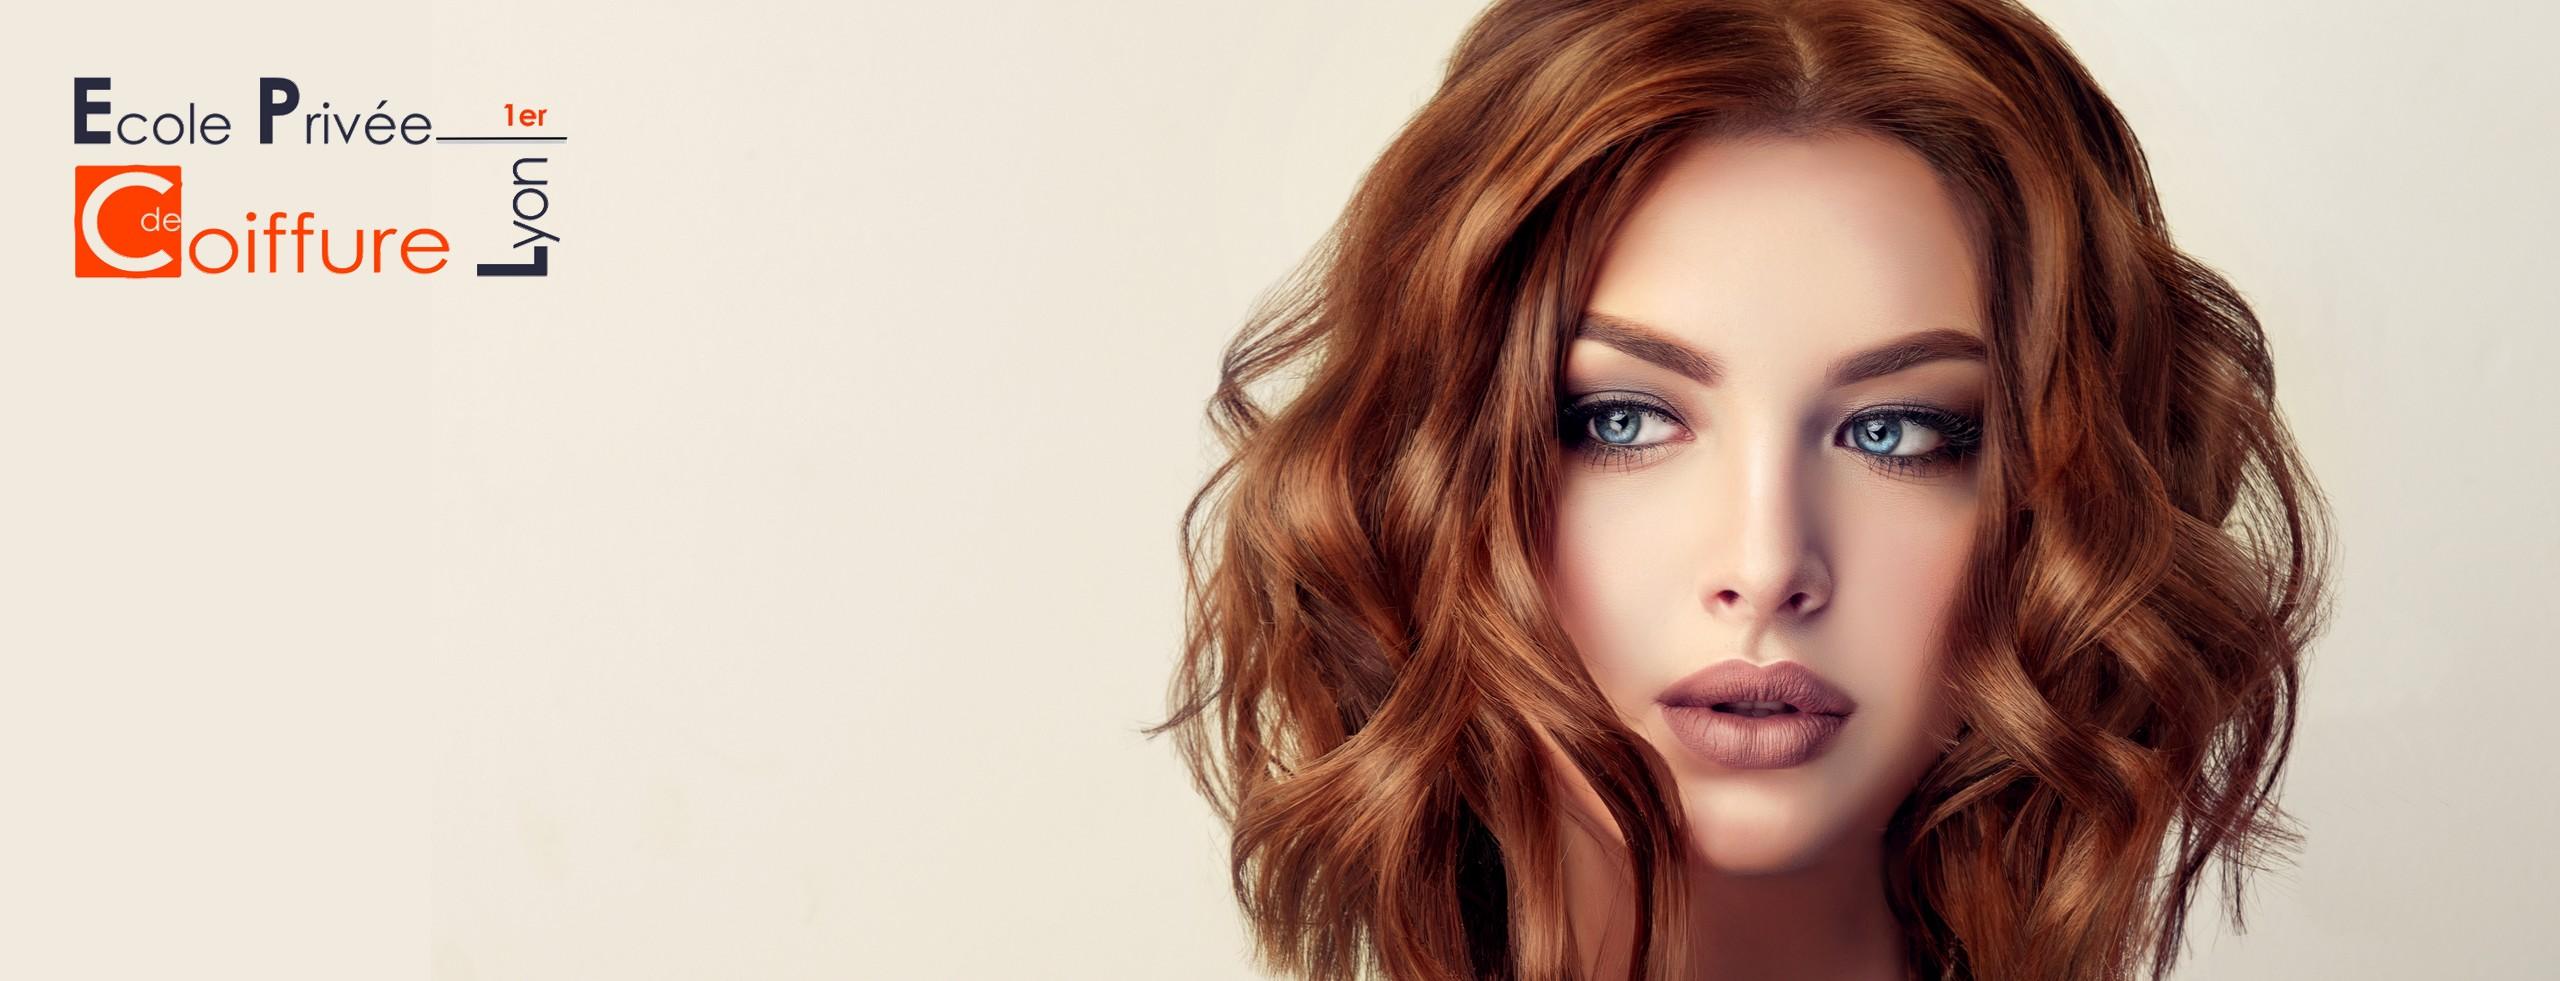 bp coiffure contrat apprentissage ecole de coiffure de lyon